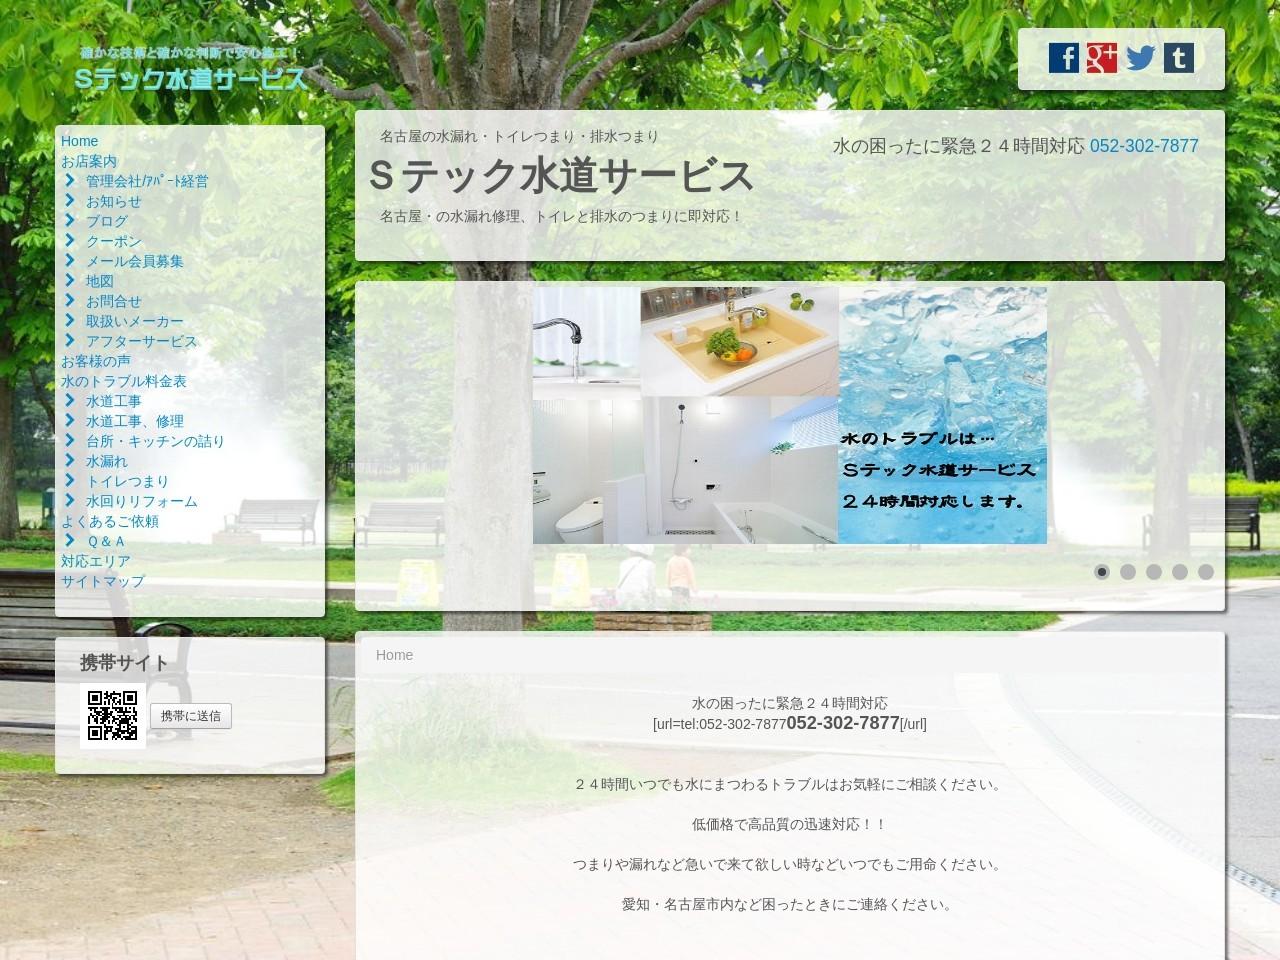 Sテック水道サービス